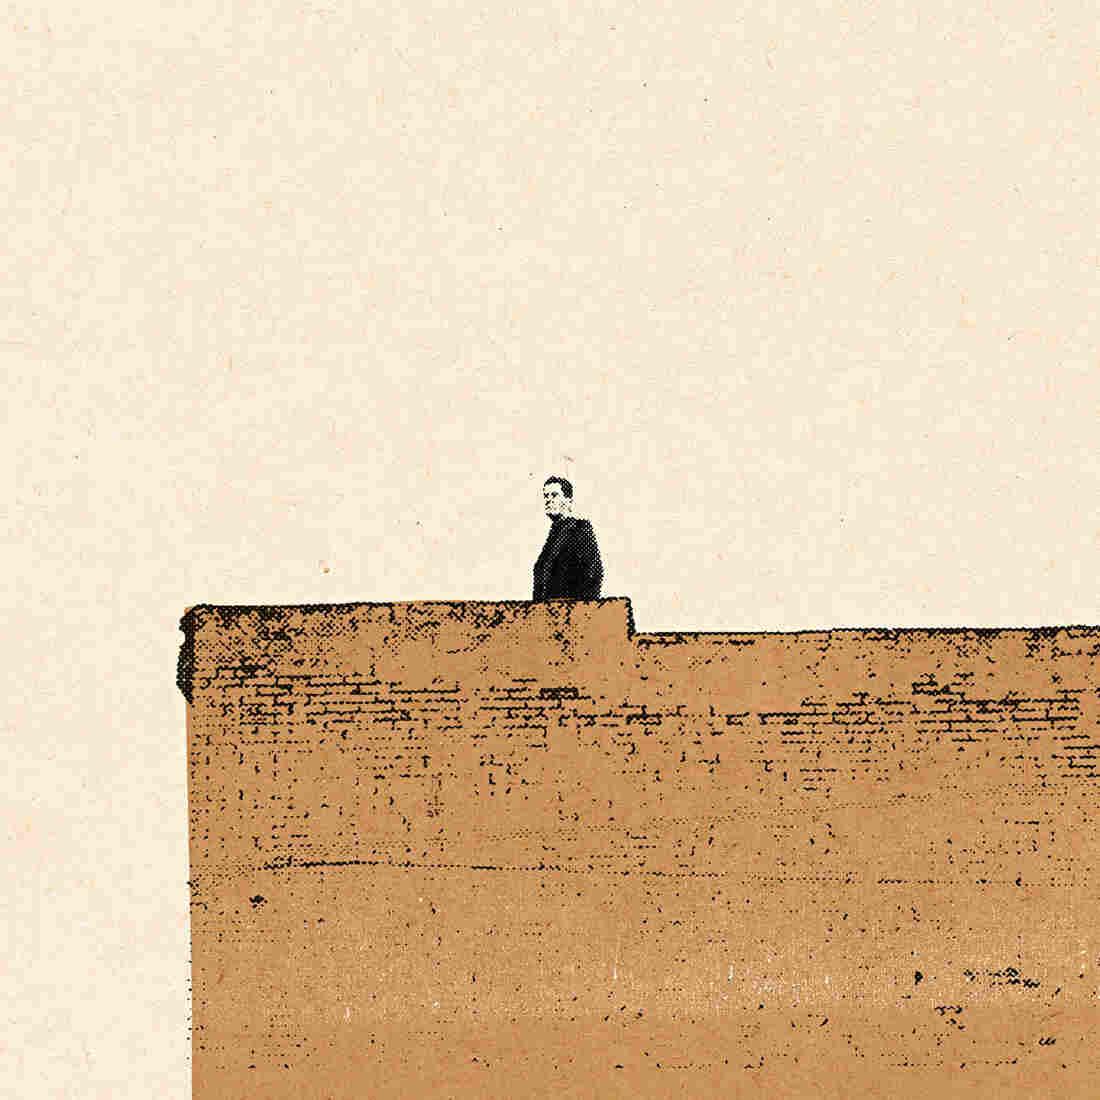 Suicides Rise In Middle-Aged Men, And Older Men Remain At Risk